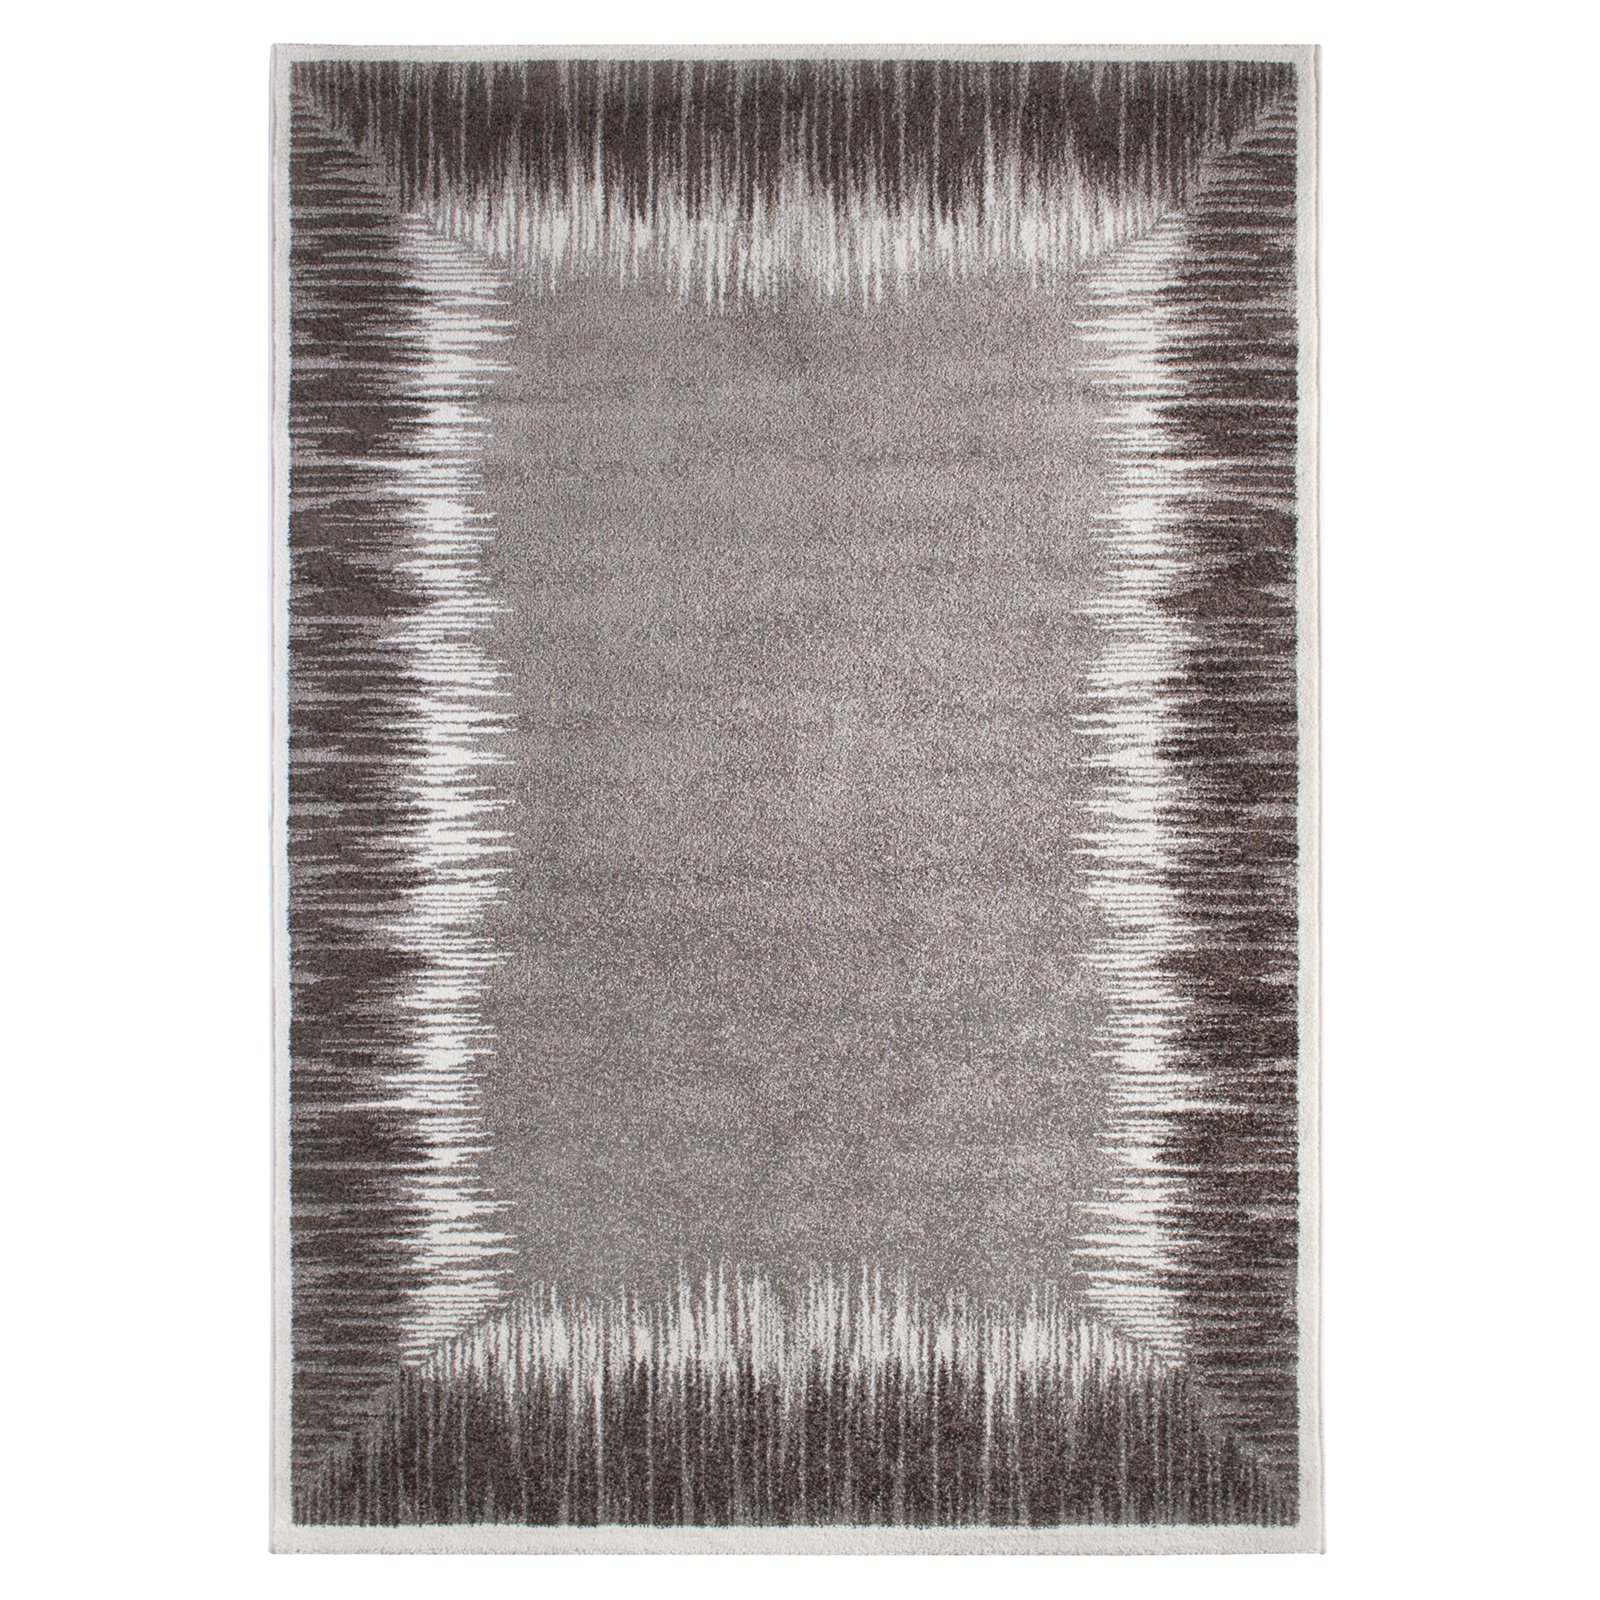 teppich grau 200x290 cm gemusterte teppiche. Black Bedroom Furniture Sets. Home Design Ideas